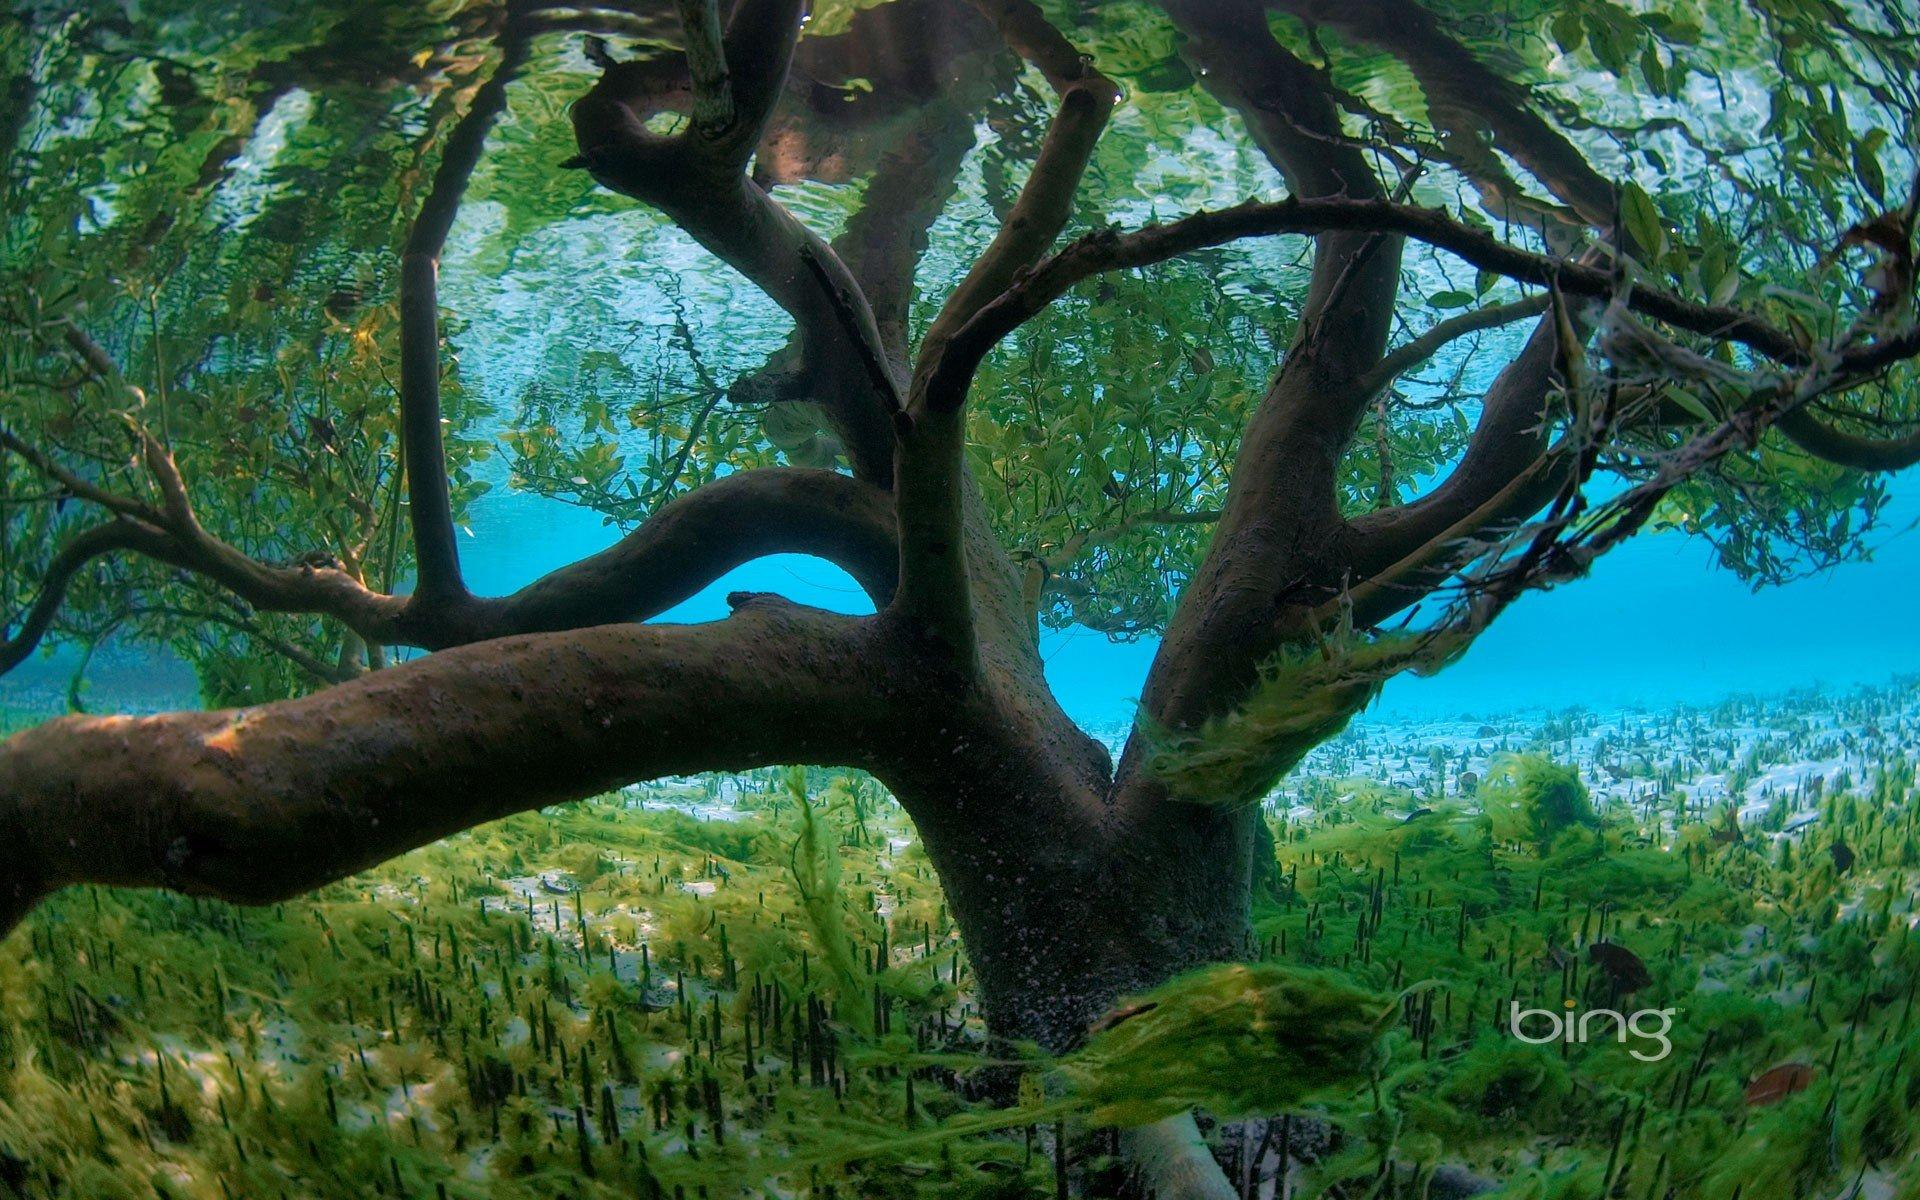 Numa Falls Canada Wallpaper Trees Plants Seychelles Underwater Branches Bing Wallpaper